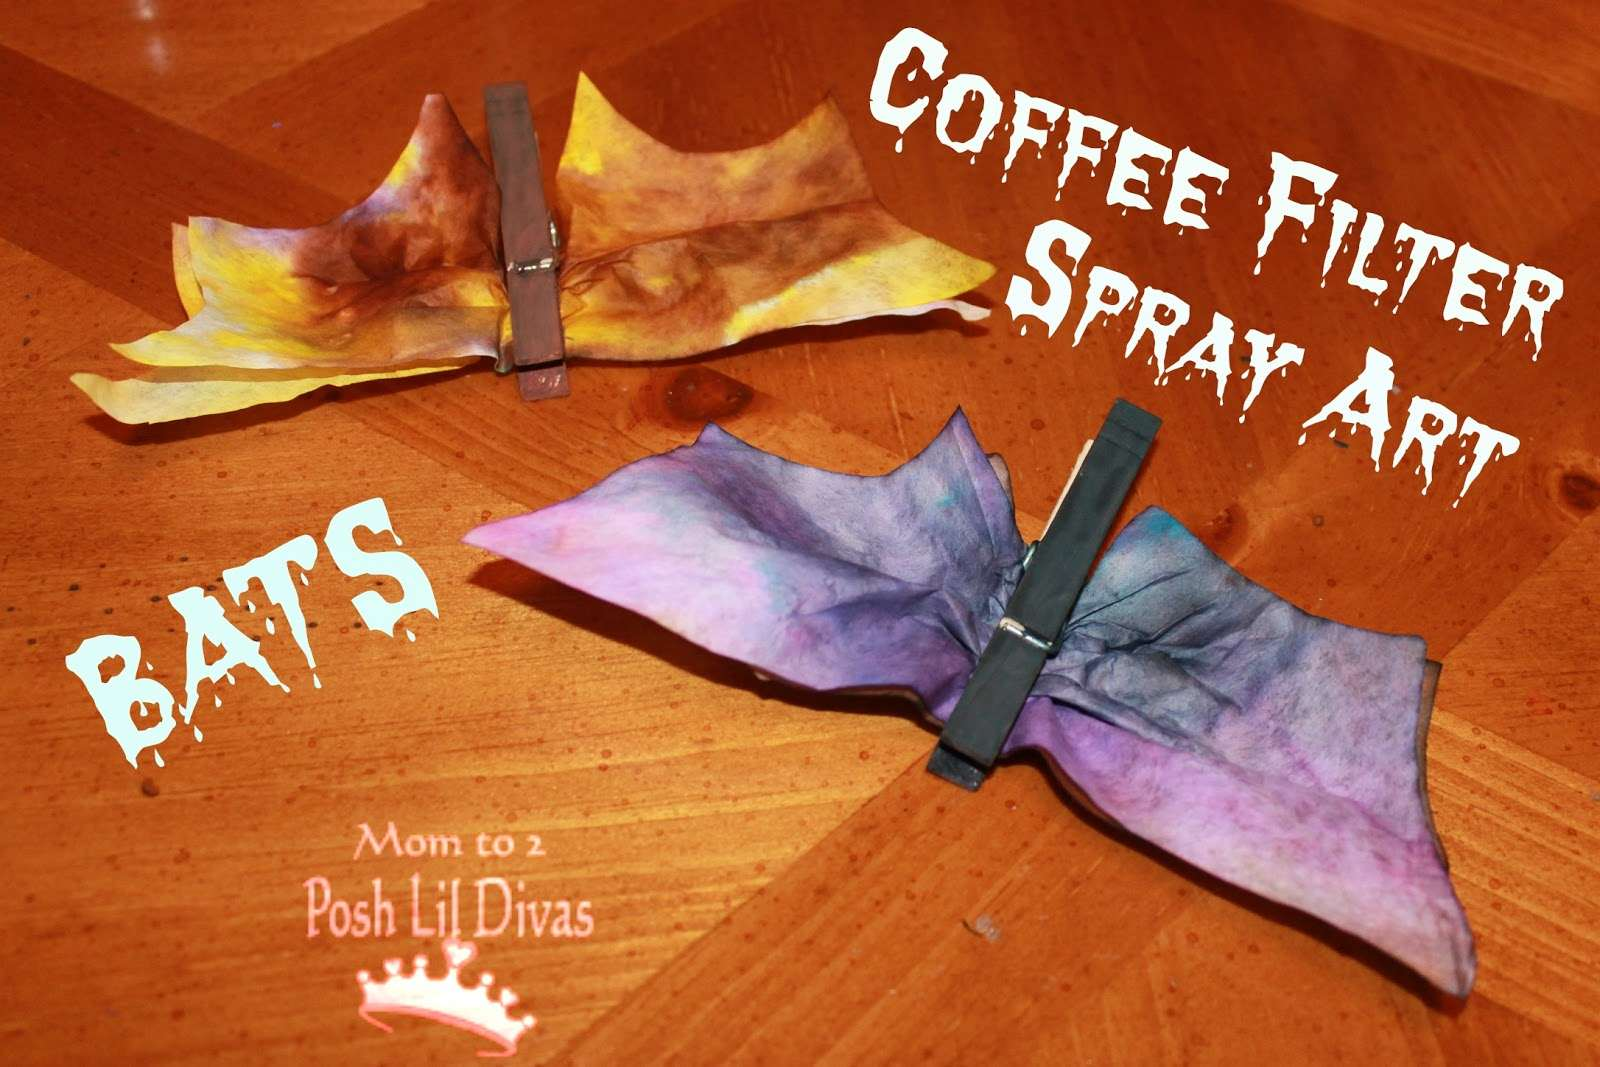 Coffee Filter Spray Art Bats by Mom to 2 Posh Lil Divas